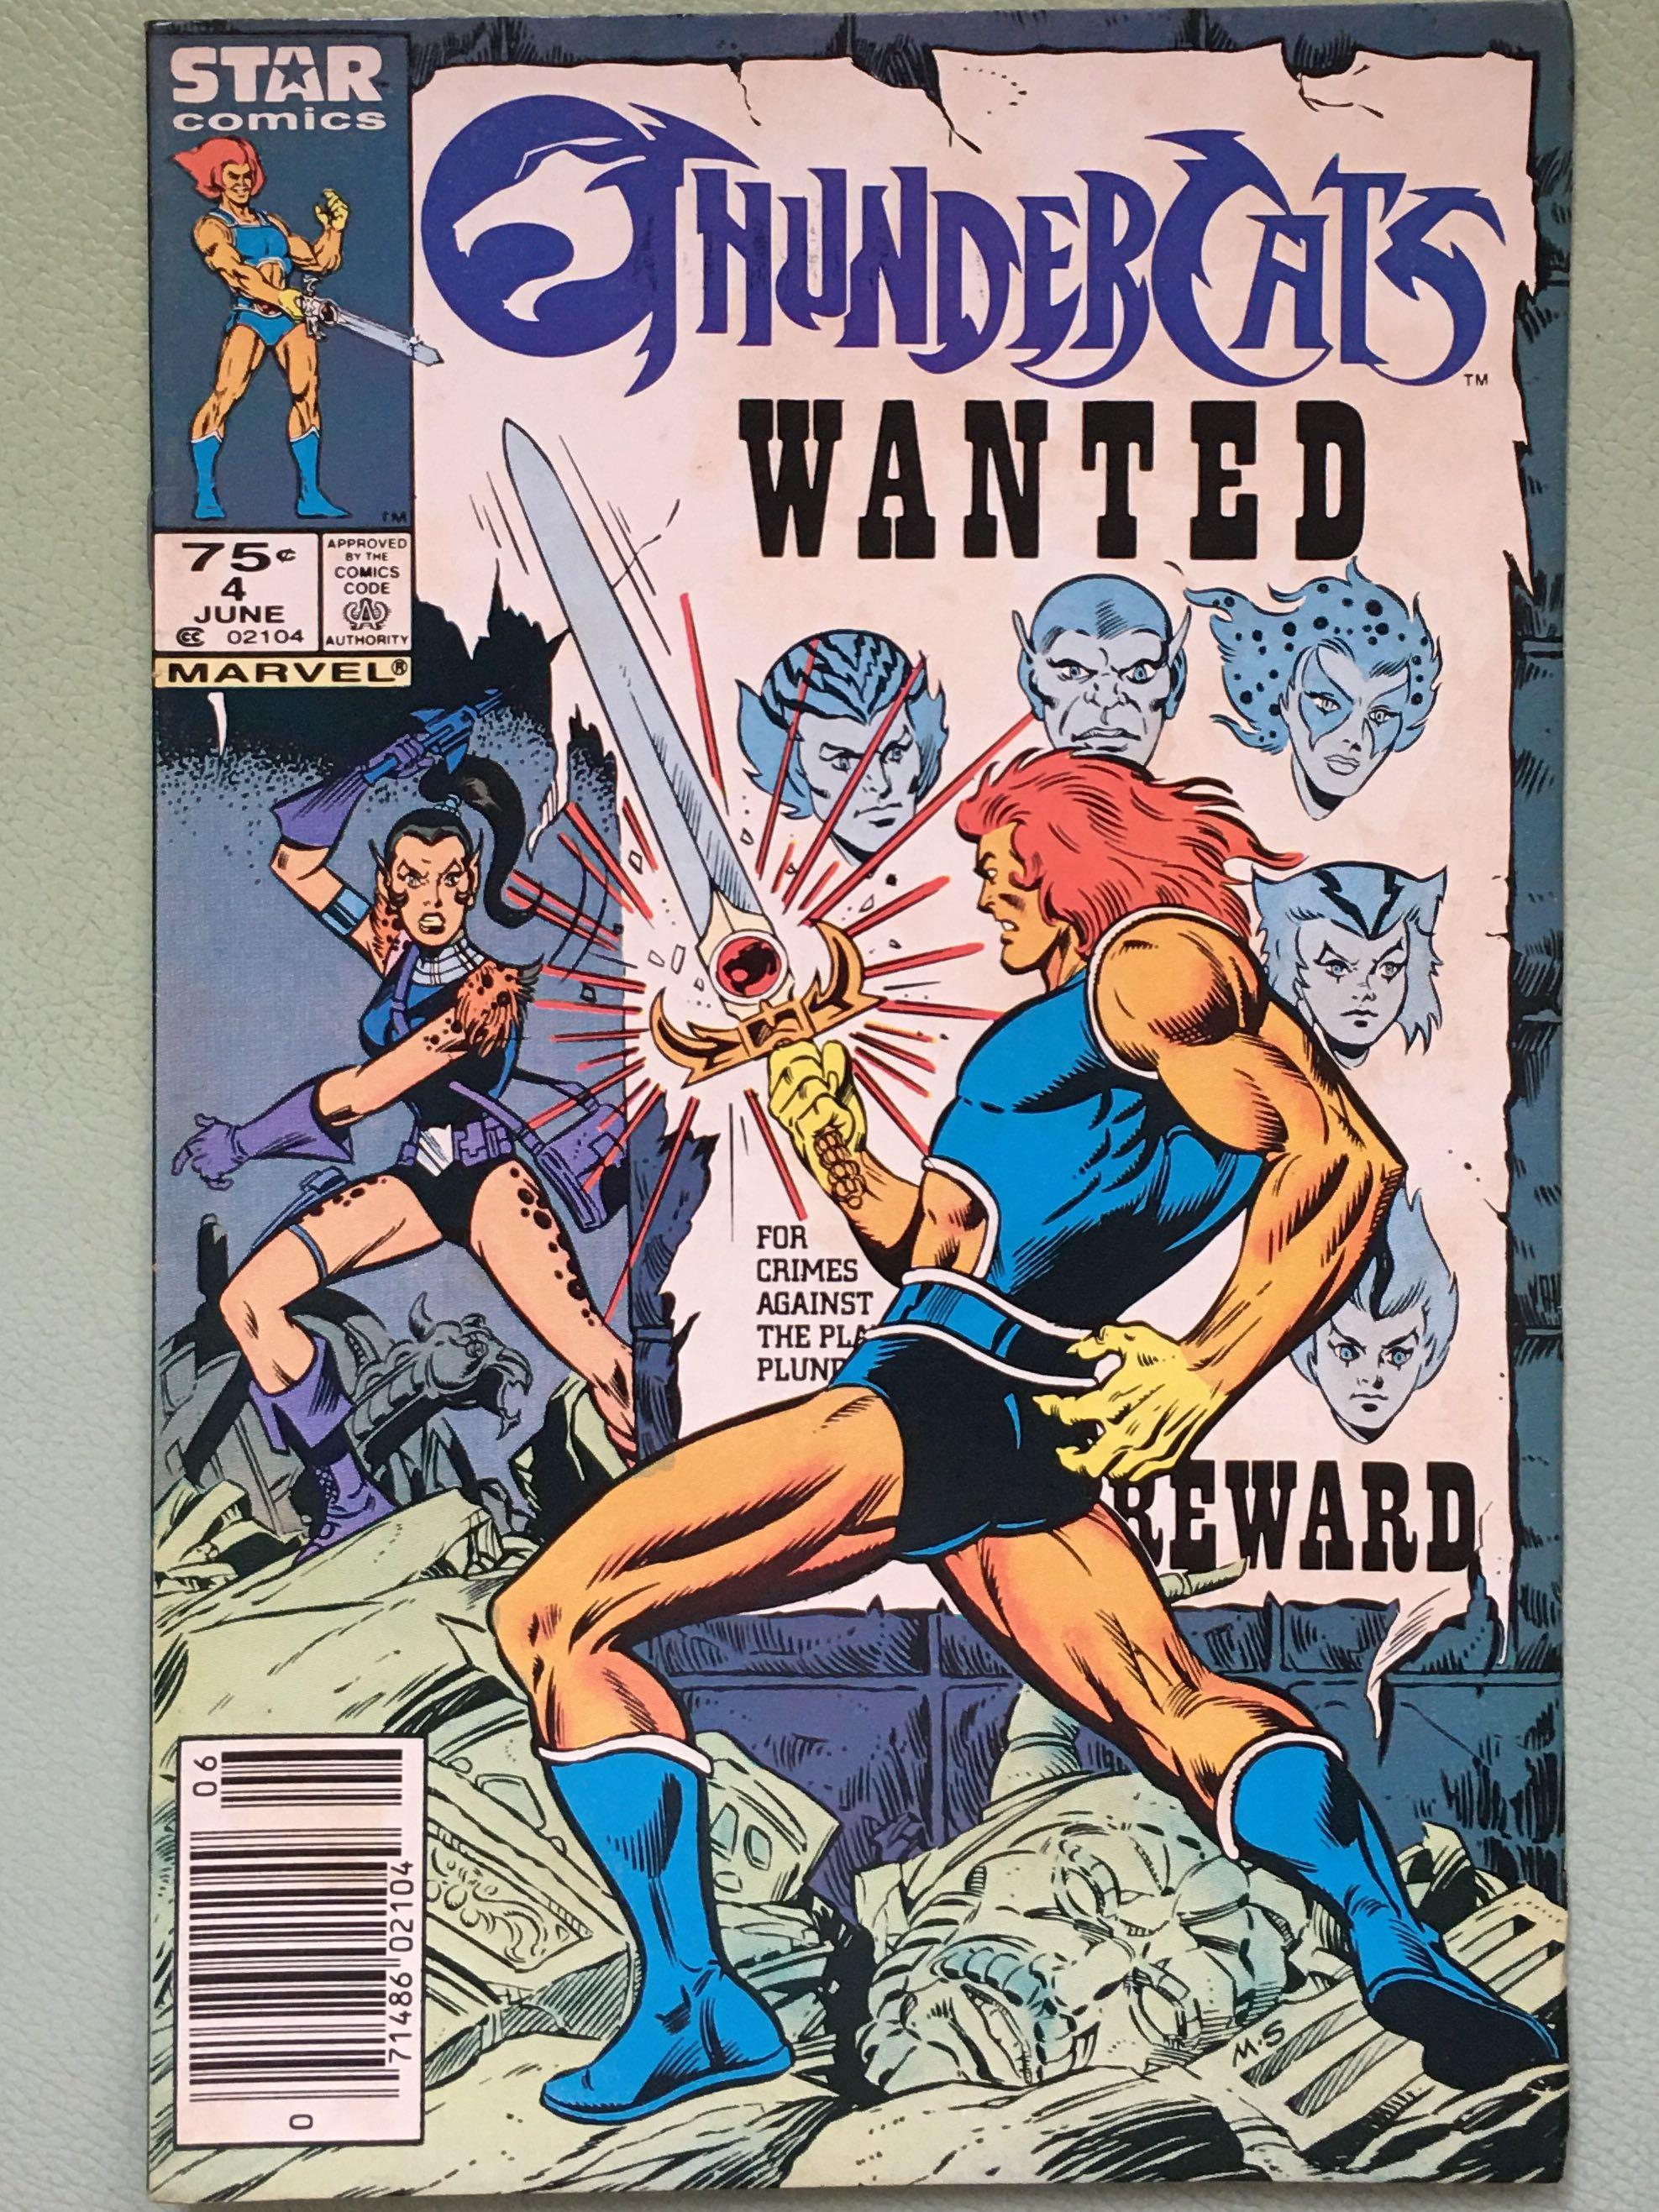 THUNDERCATS #3,4,5,6,7,9_TV Cartoon Tie-in_Marvel Comics_P150 EACH